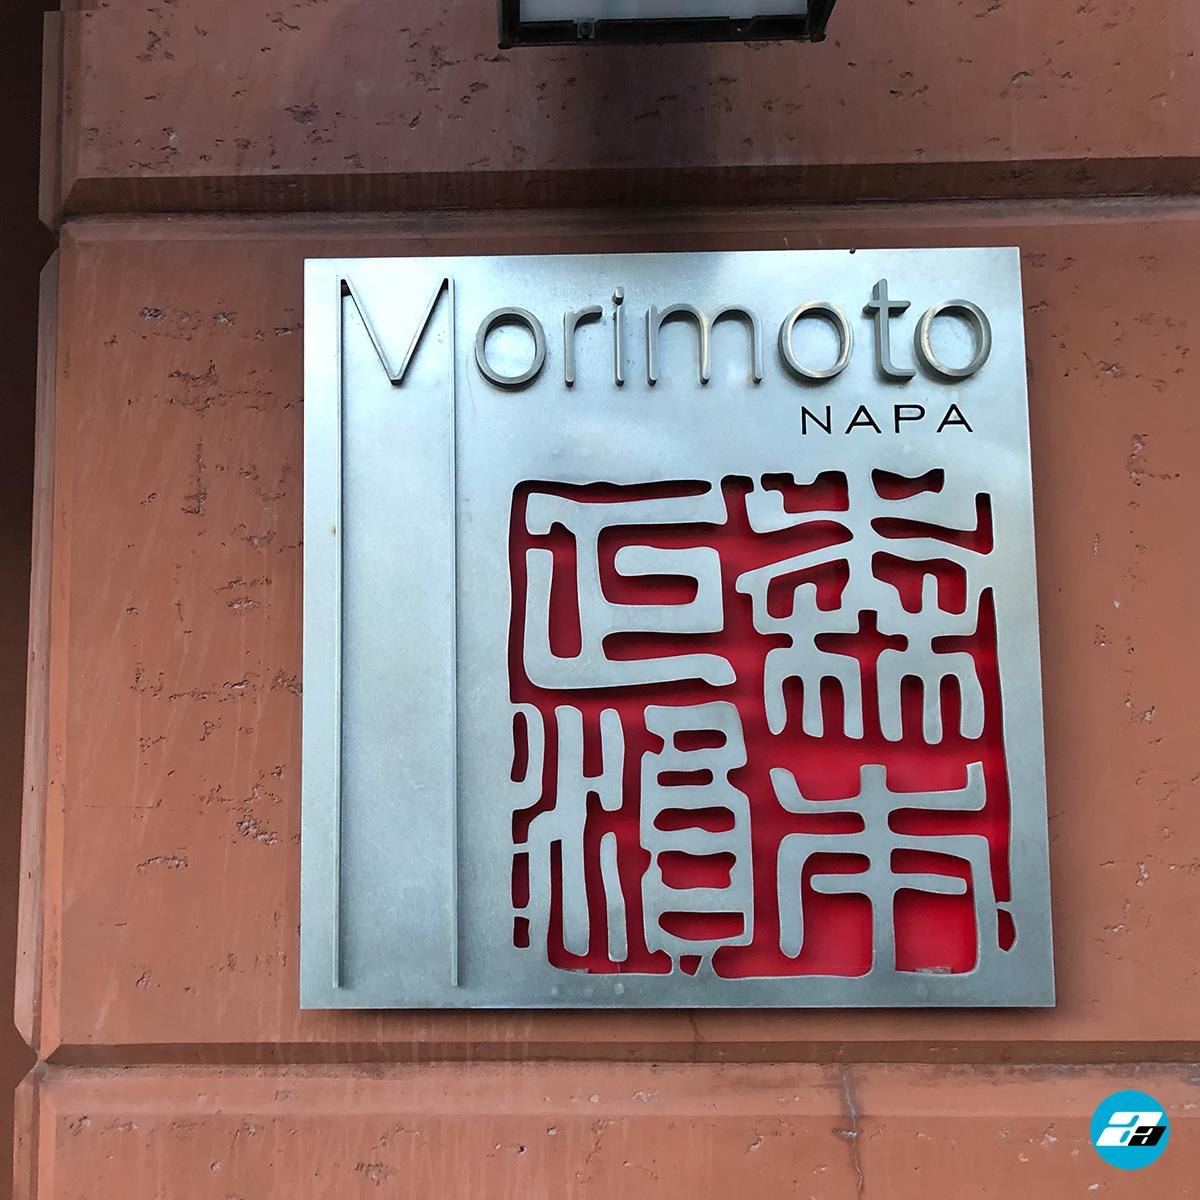 Morimoto Napa, CA